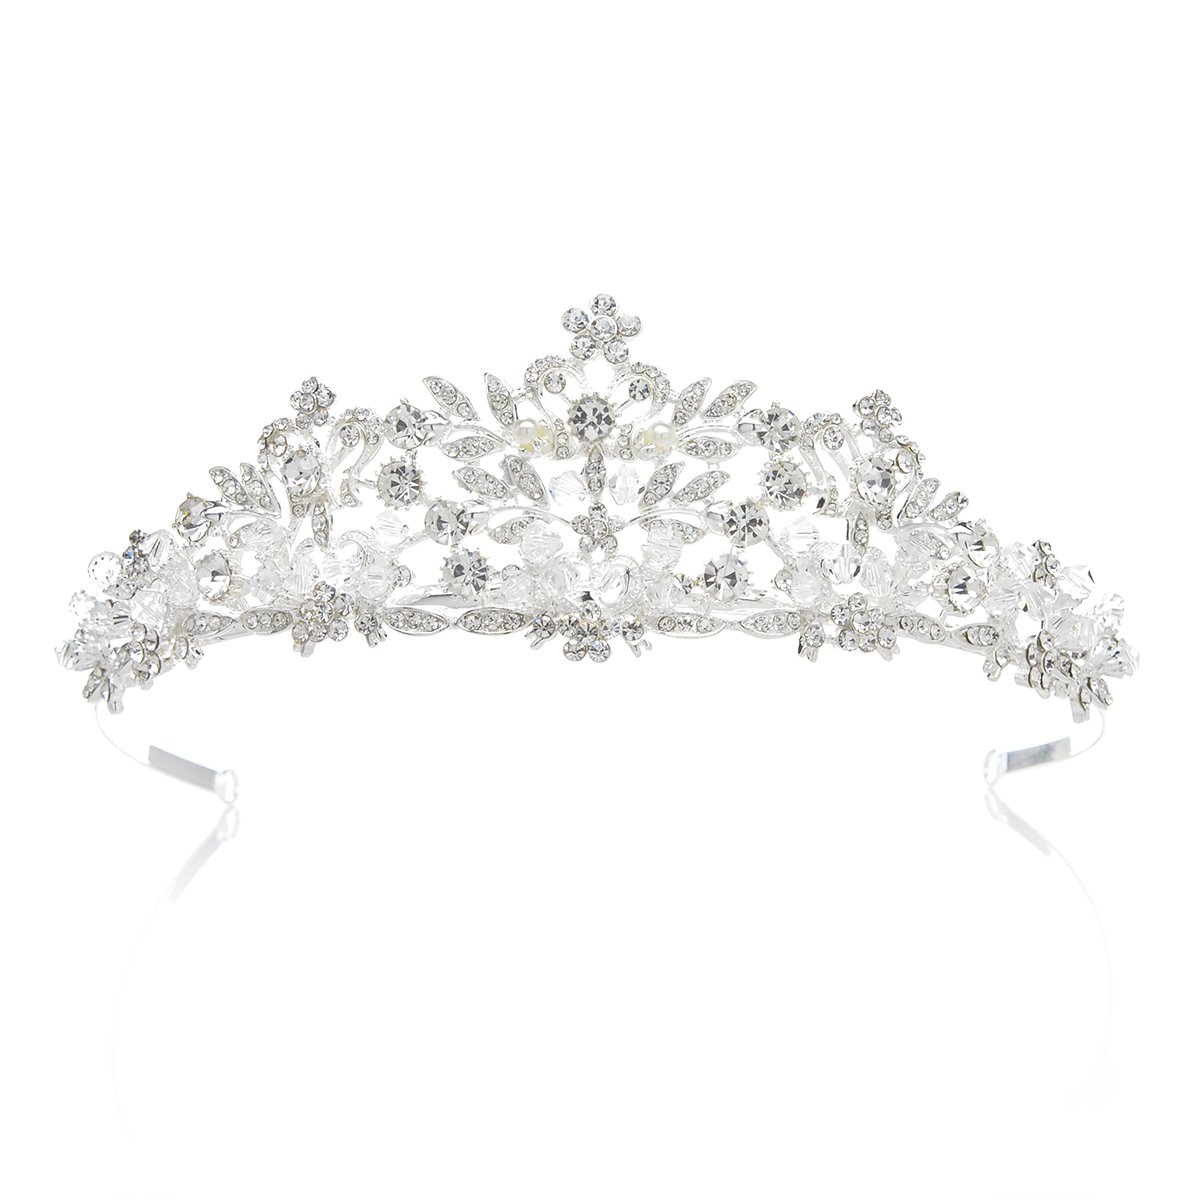 SWEETV Fairytale Rhinestone Princess Crown Wedding Tiara Party Hats Pageant Hair Jewelry, Silver+Clear